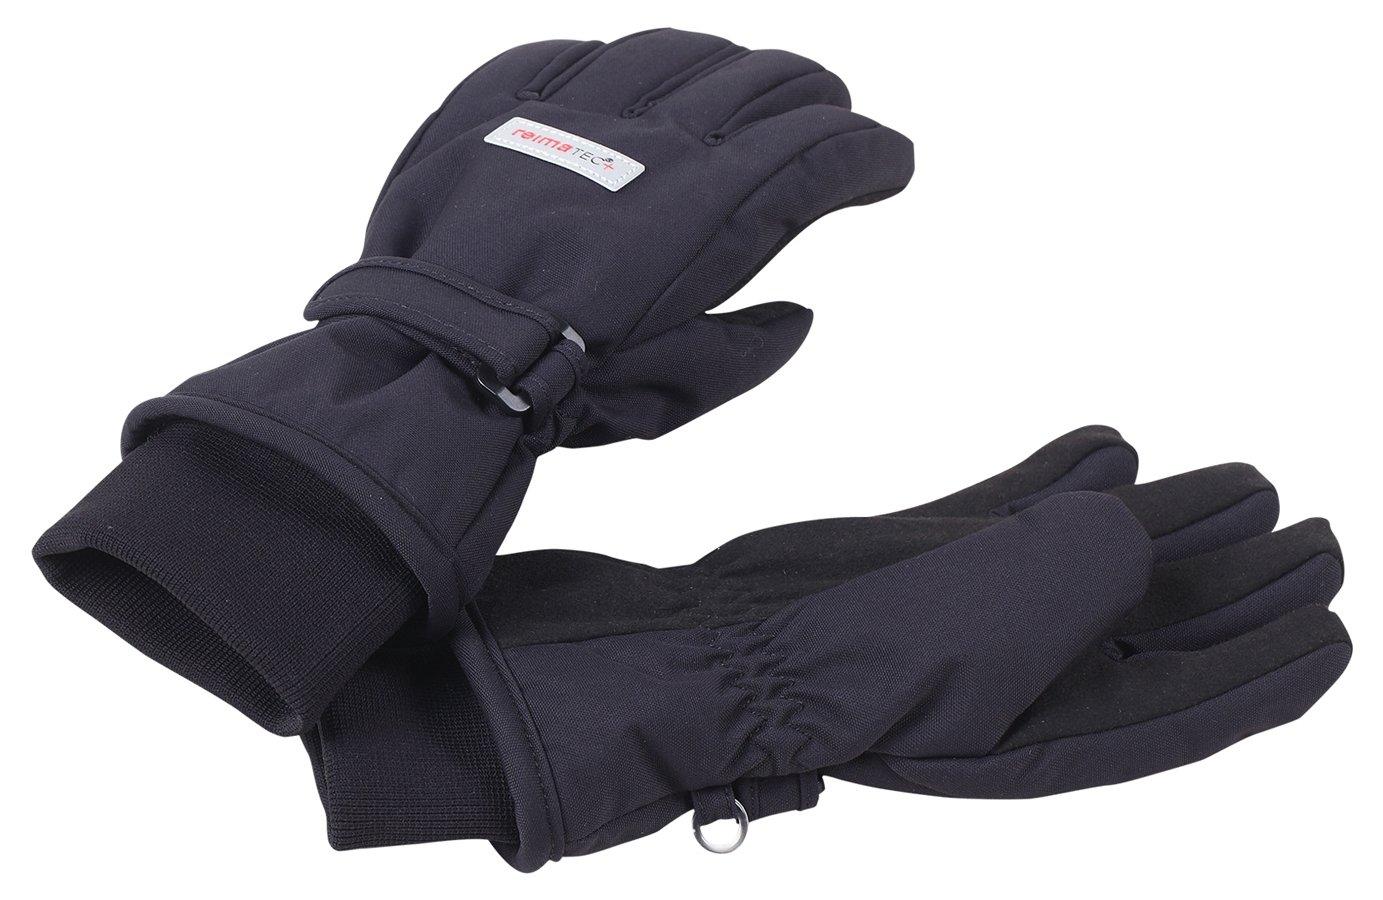 Dětské rukavice Reima 527251 Tartu black